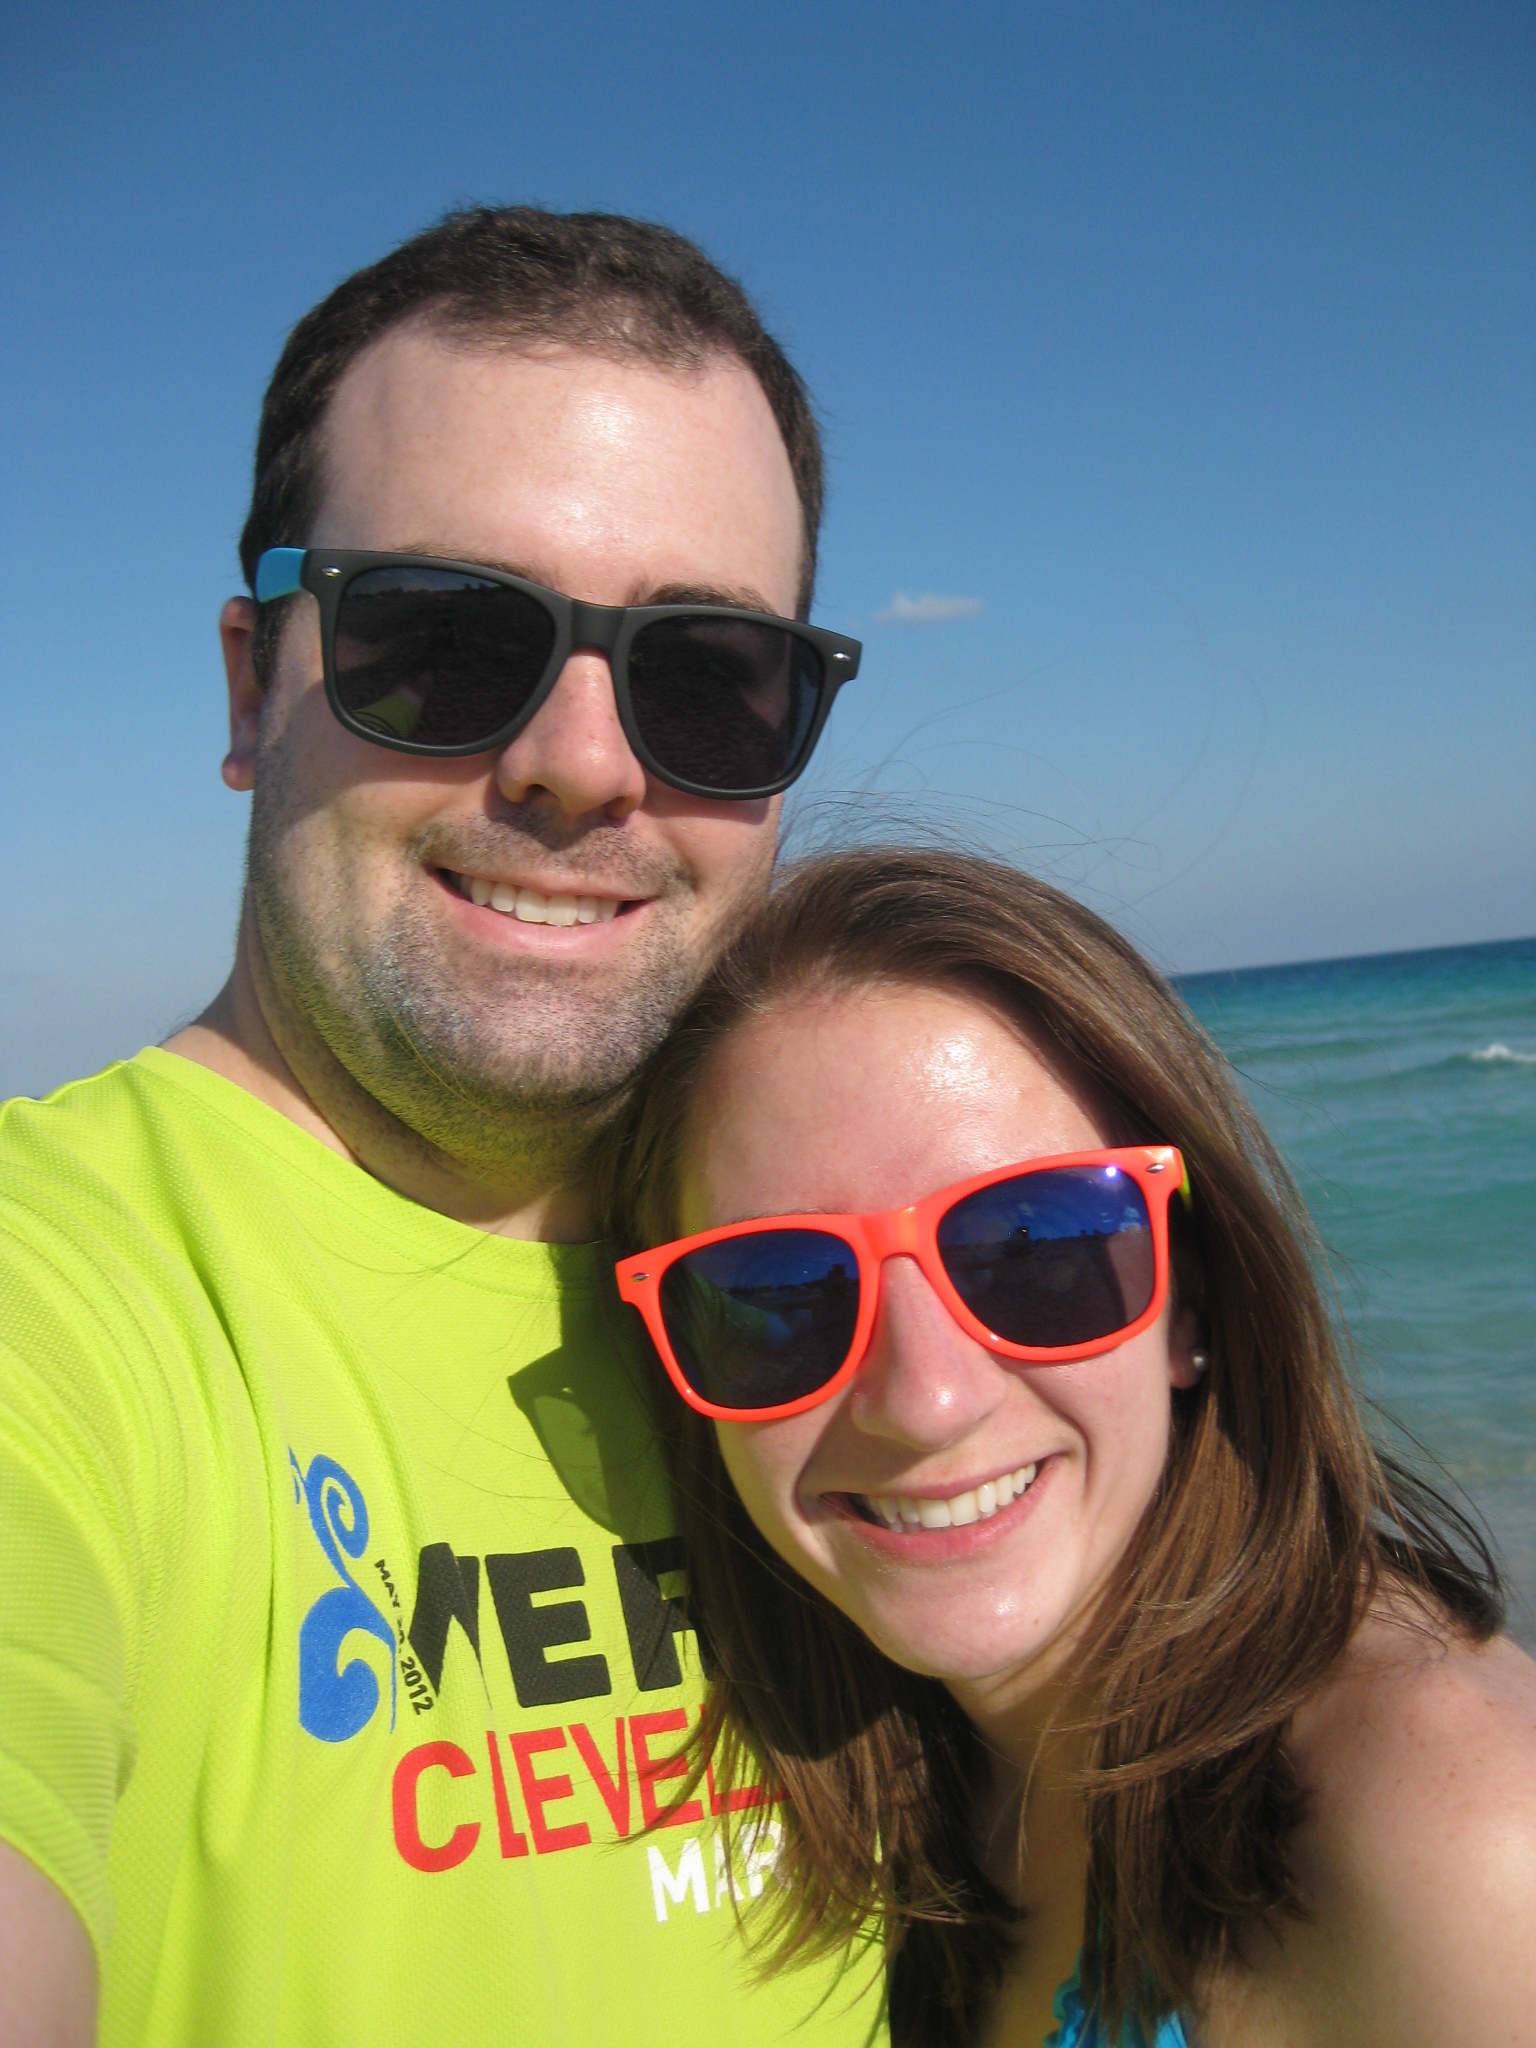 mandatory selfie on the beach